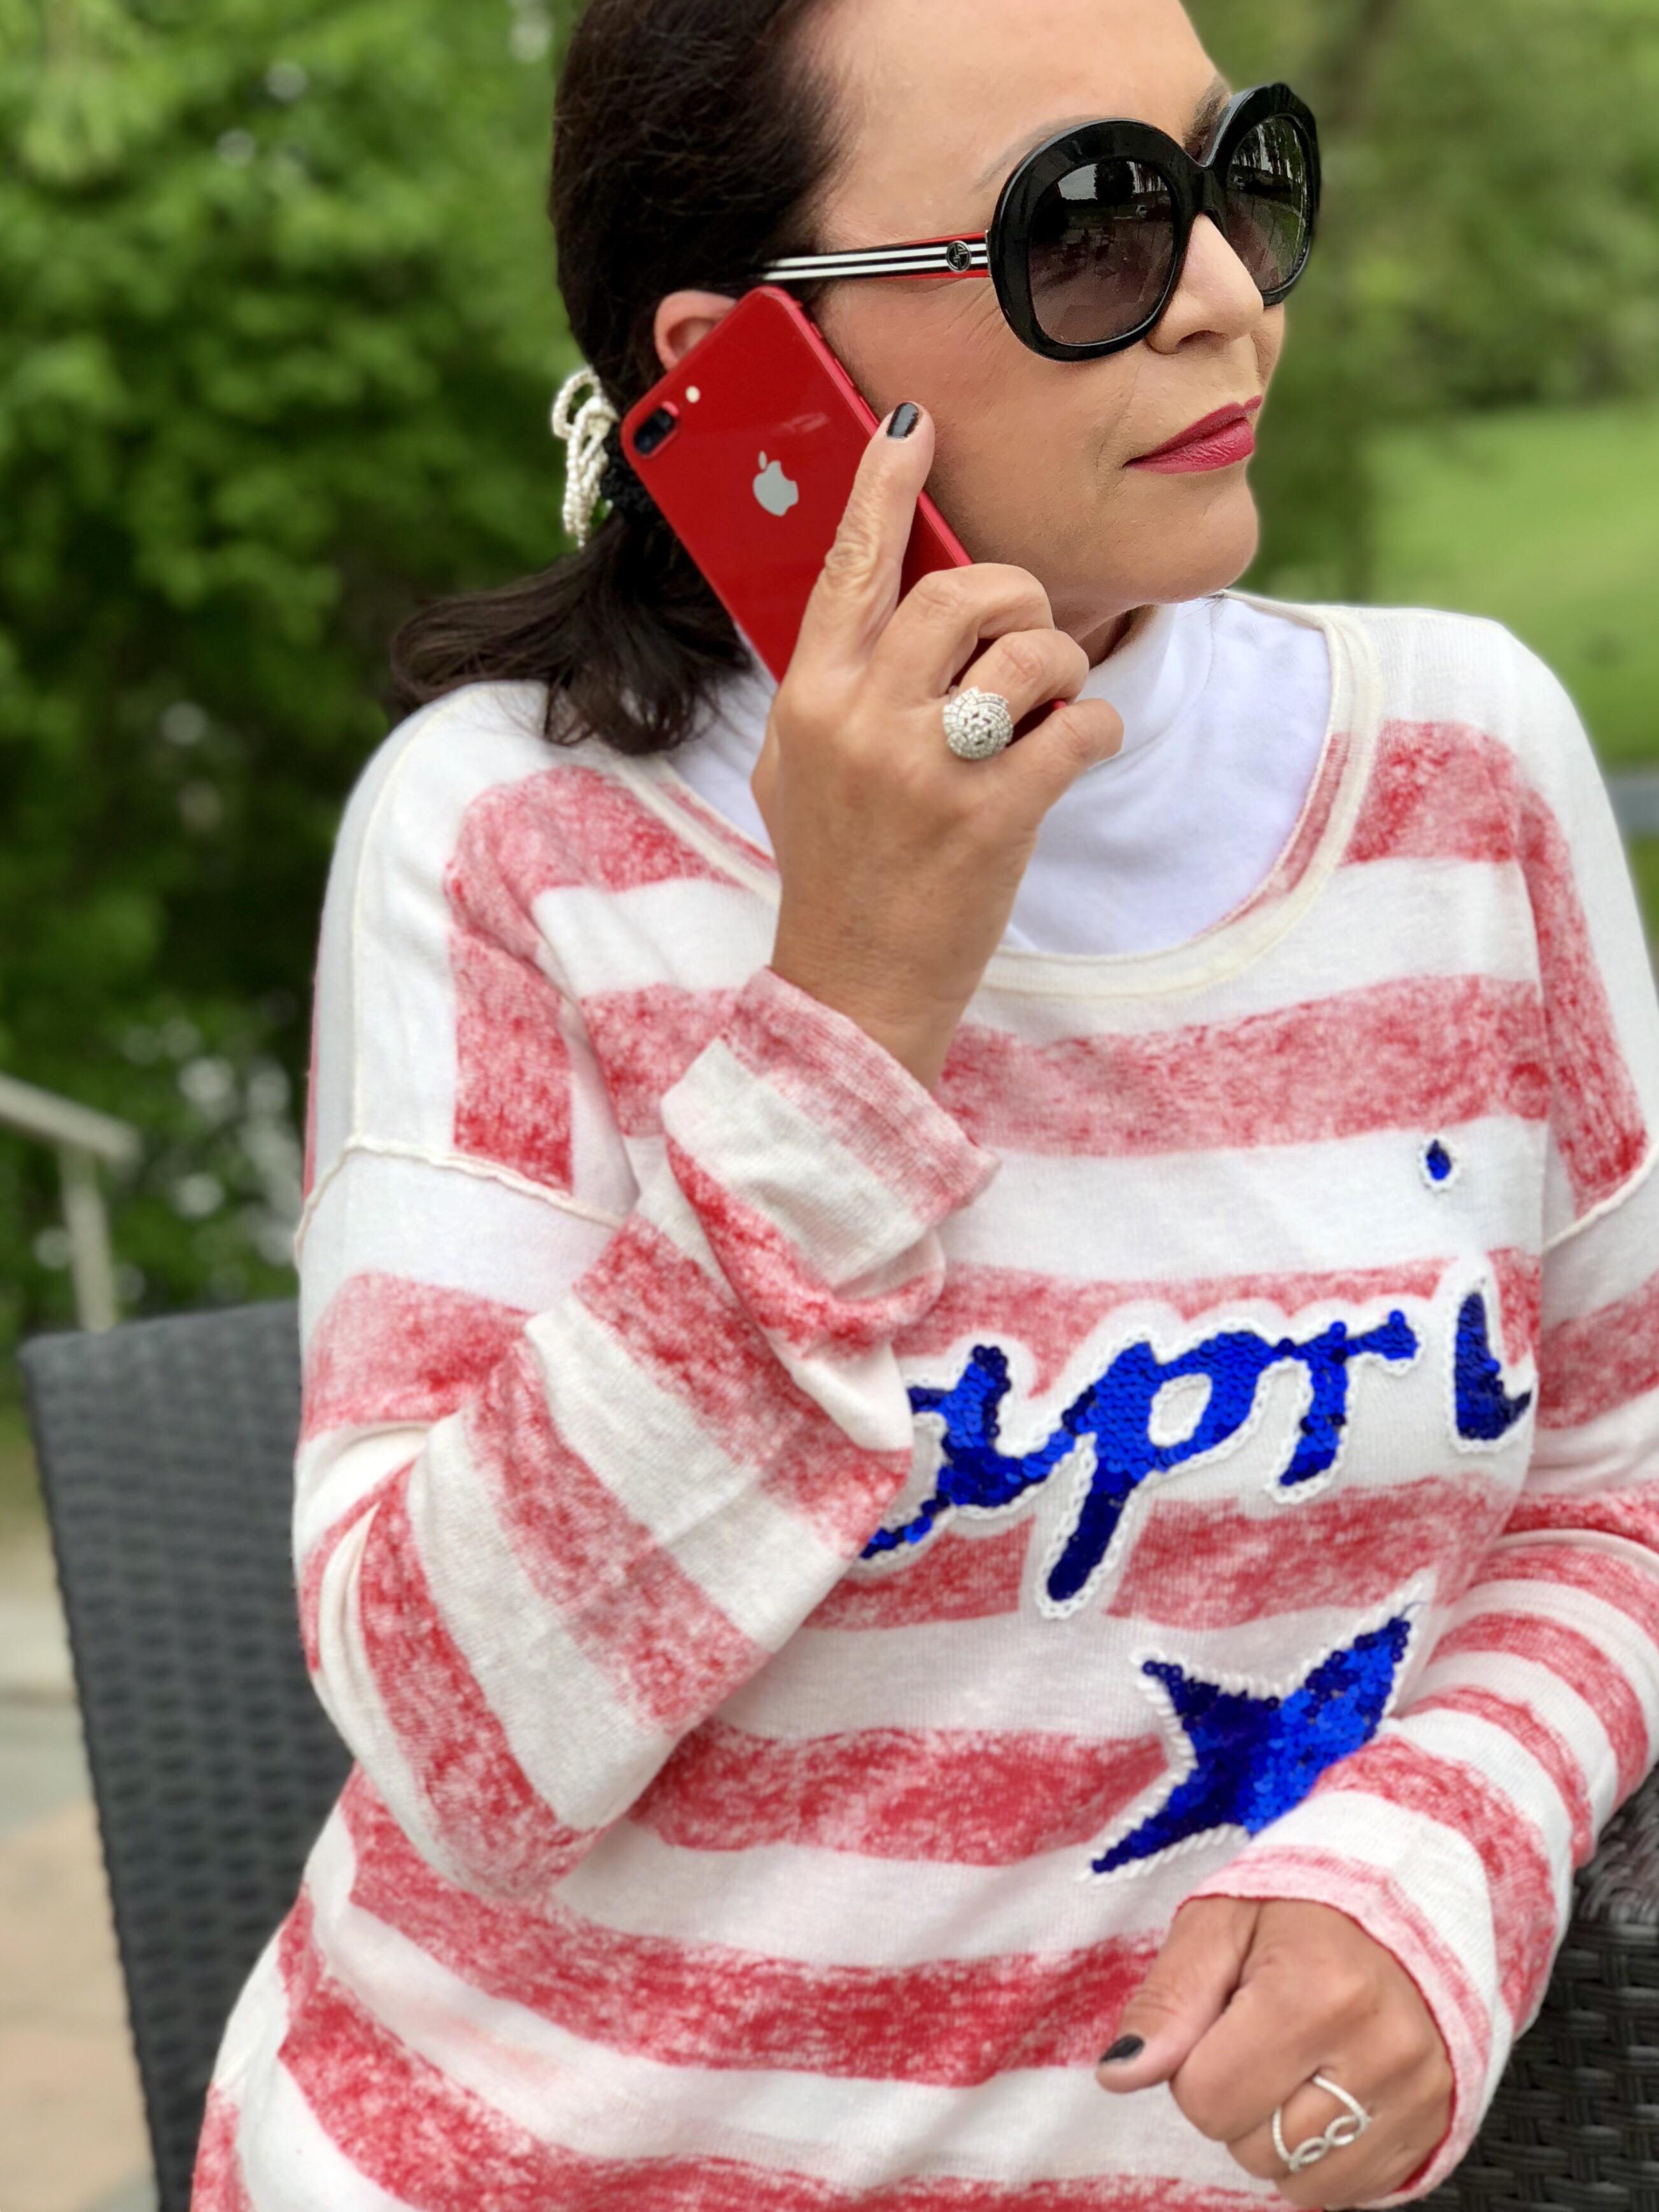 Grace fashion, Marciano jeans, iPhone8plus, Giorgio Armani eyewear, eyewerfashion, Buffalo shoes, Fashionblog Augsburg, Modeblogger, ageless fashion, style for Ladies, Bekleidung, Damenmode, mystyle, styleinspiration, streetchic, streetstyle, fashionphotography